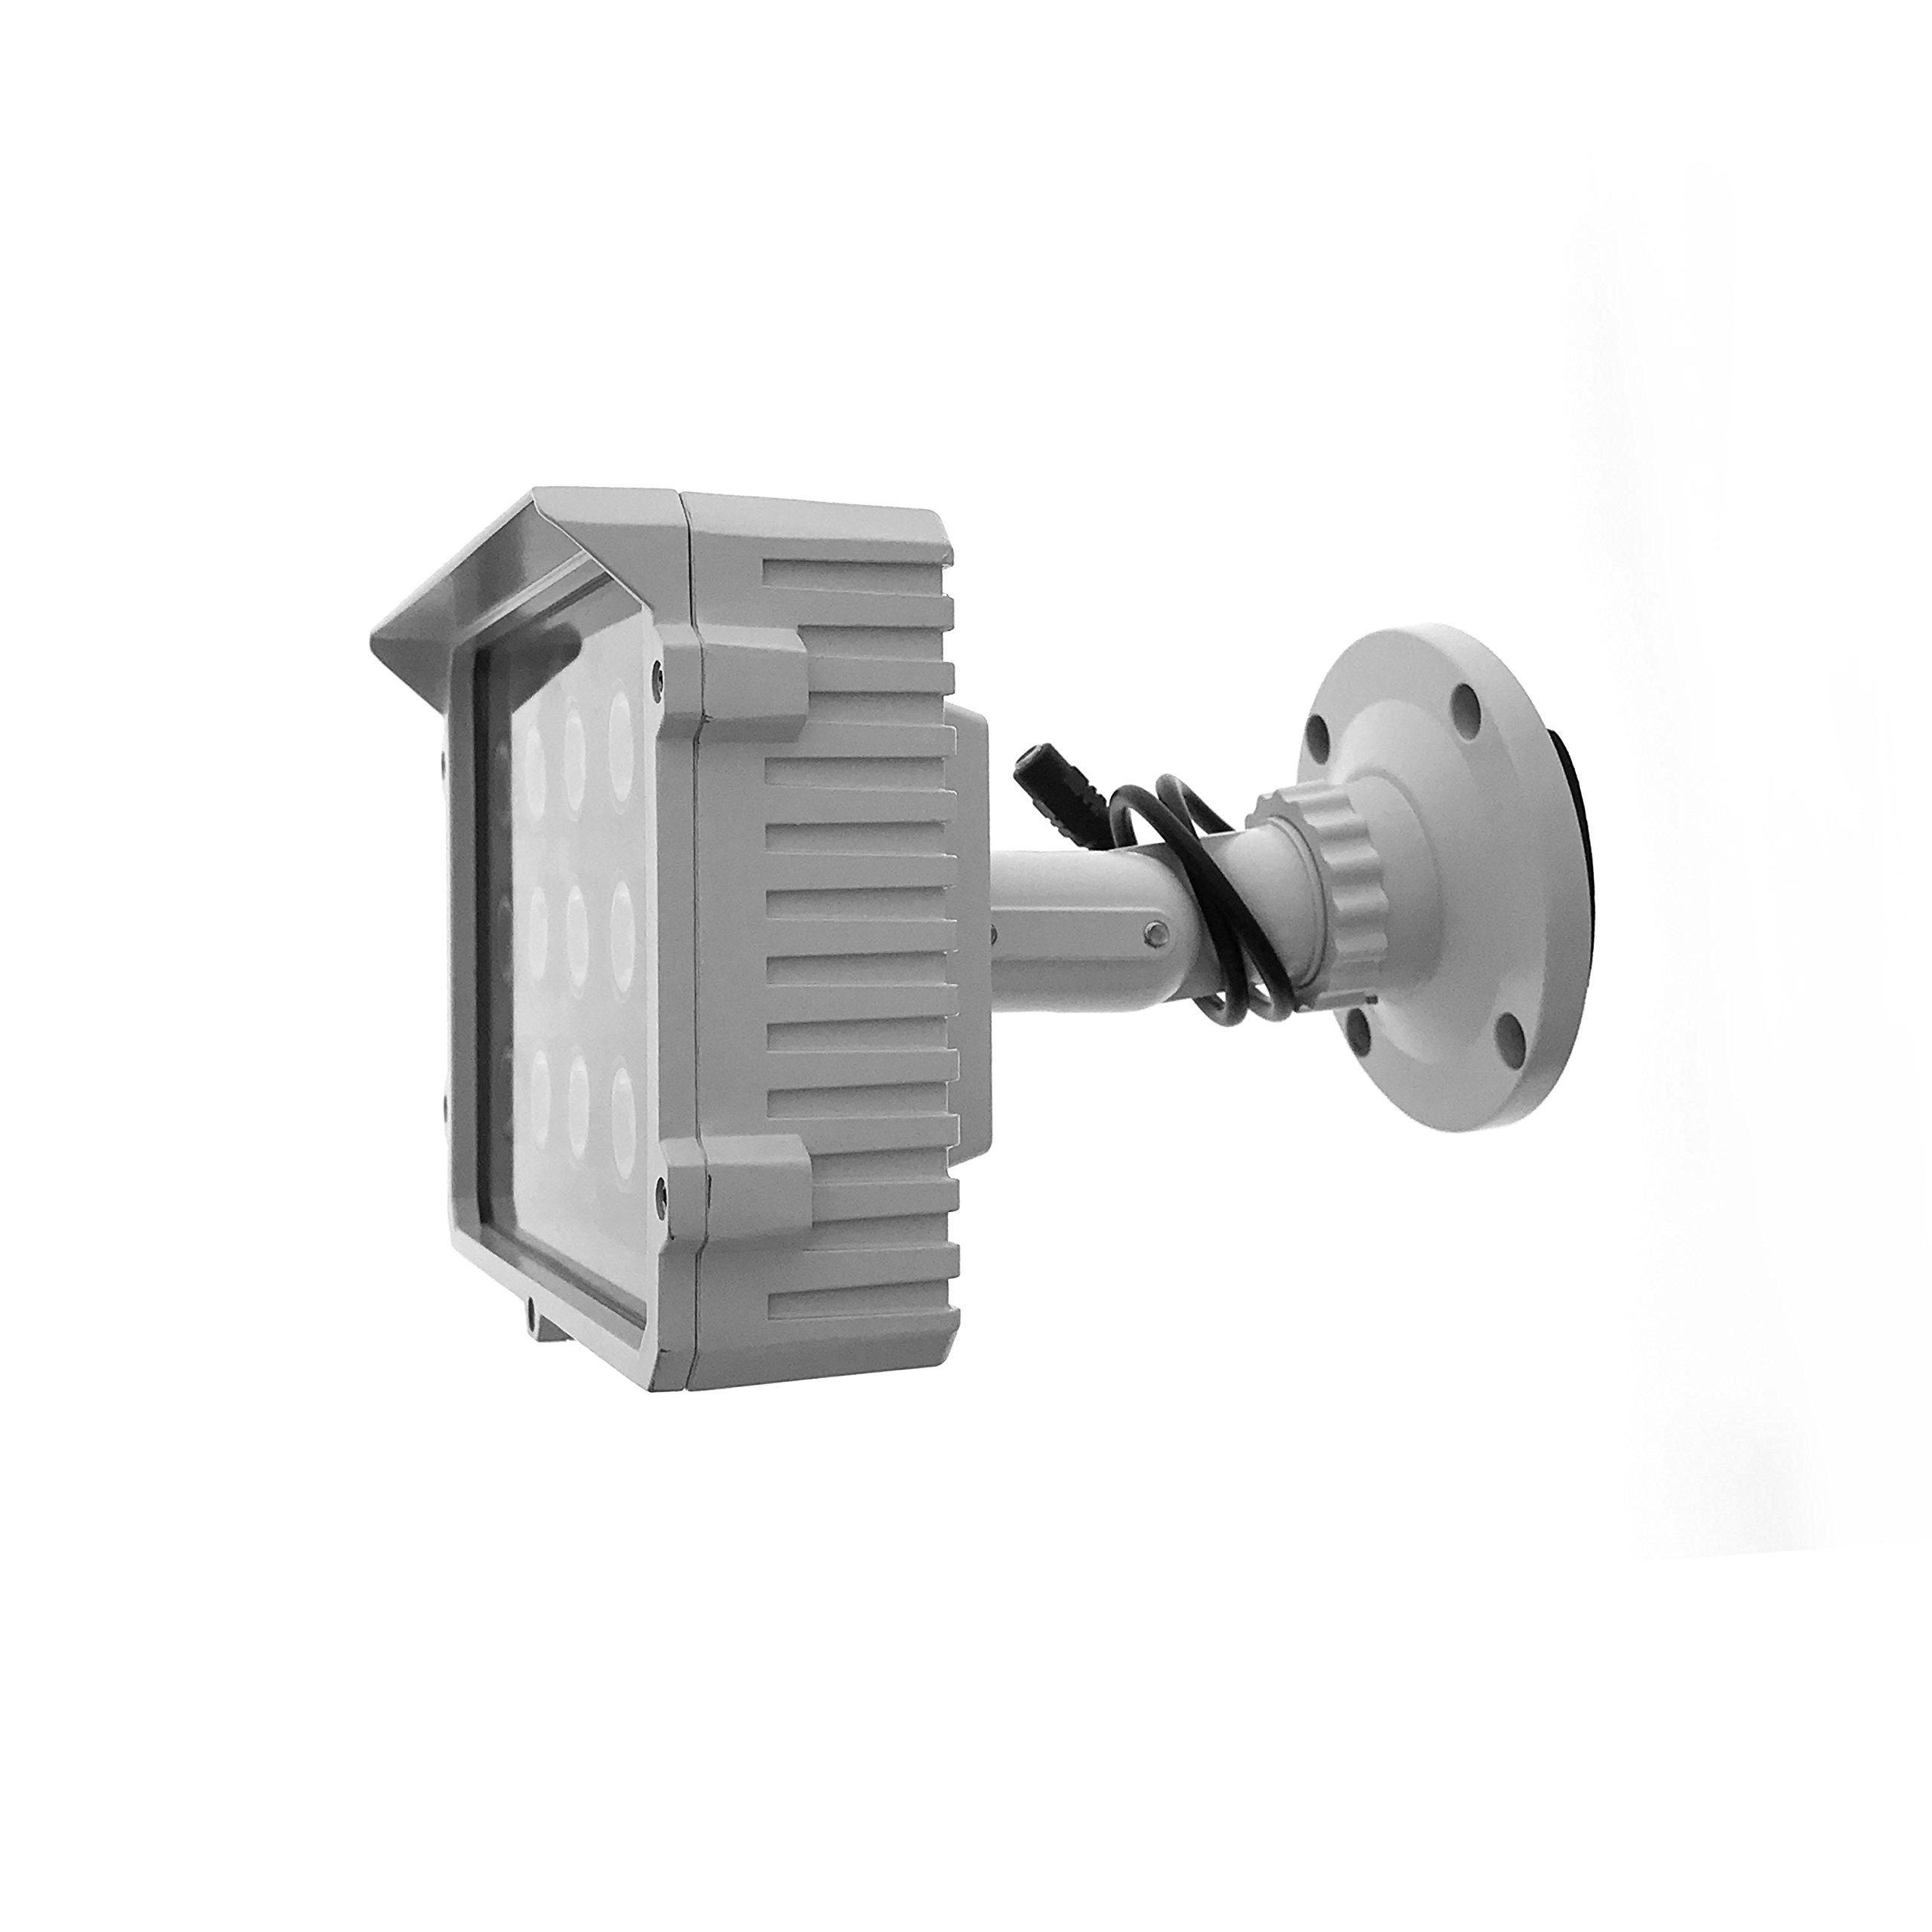 CMVision CMVE-IR15 Wide Angle 60-80° Power LED IR Array Illuminator 200-300' Long Range with Free 12VDC 3A Power Adaptor, 15 Piece by CMVision (Image #4)